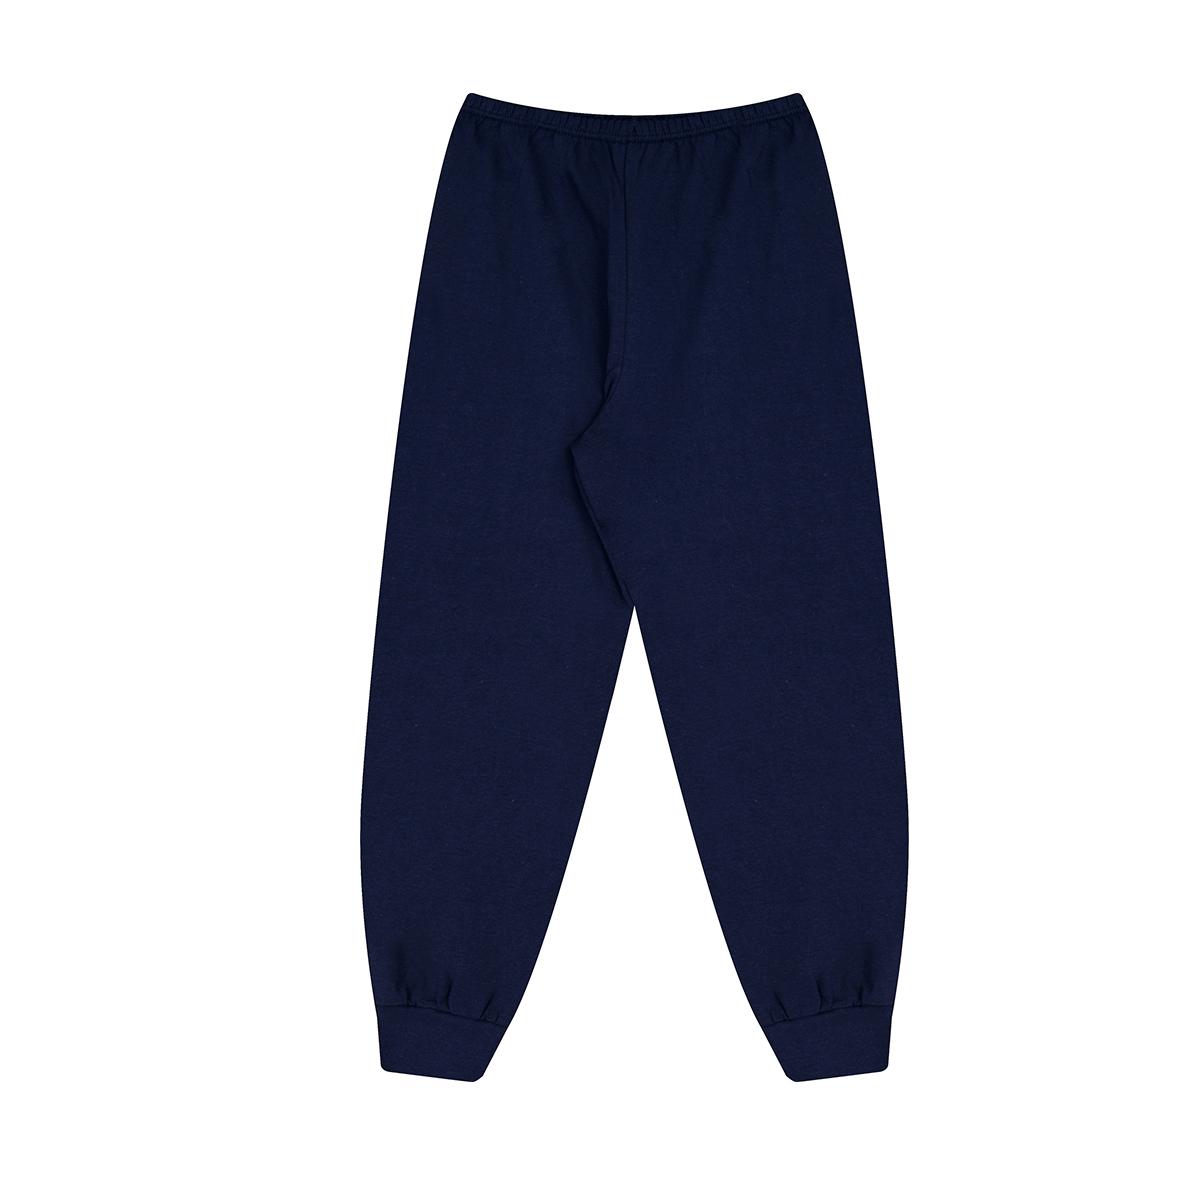 Pijama Infantil Menina Estampado Manga Longa e Calça Inverno